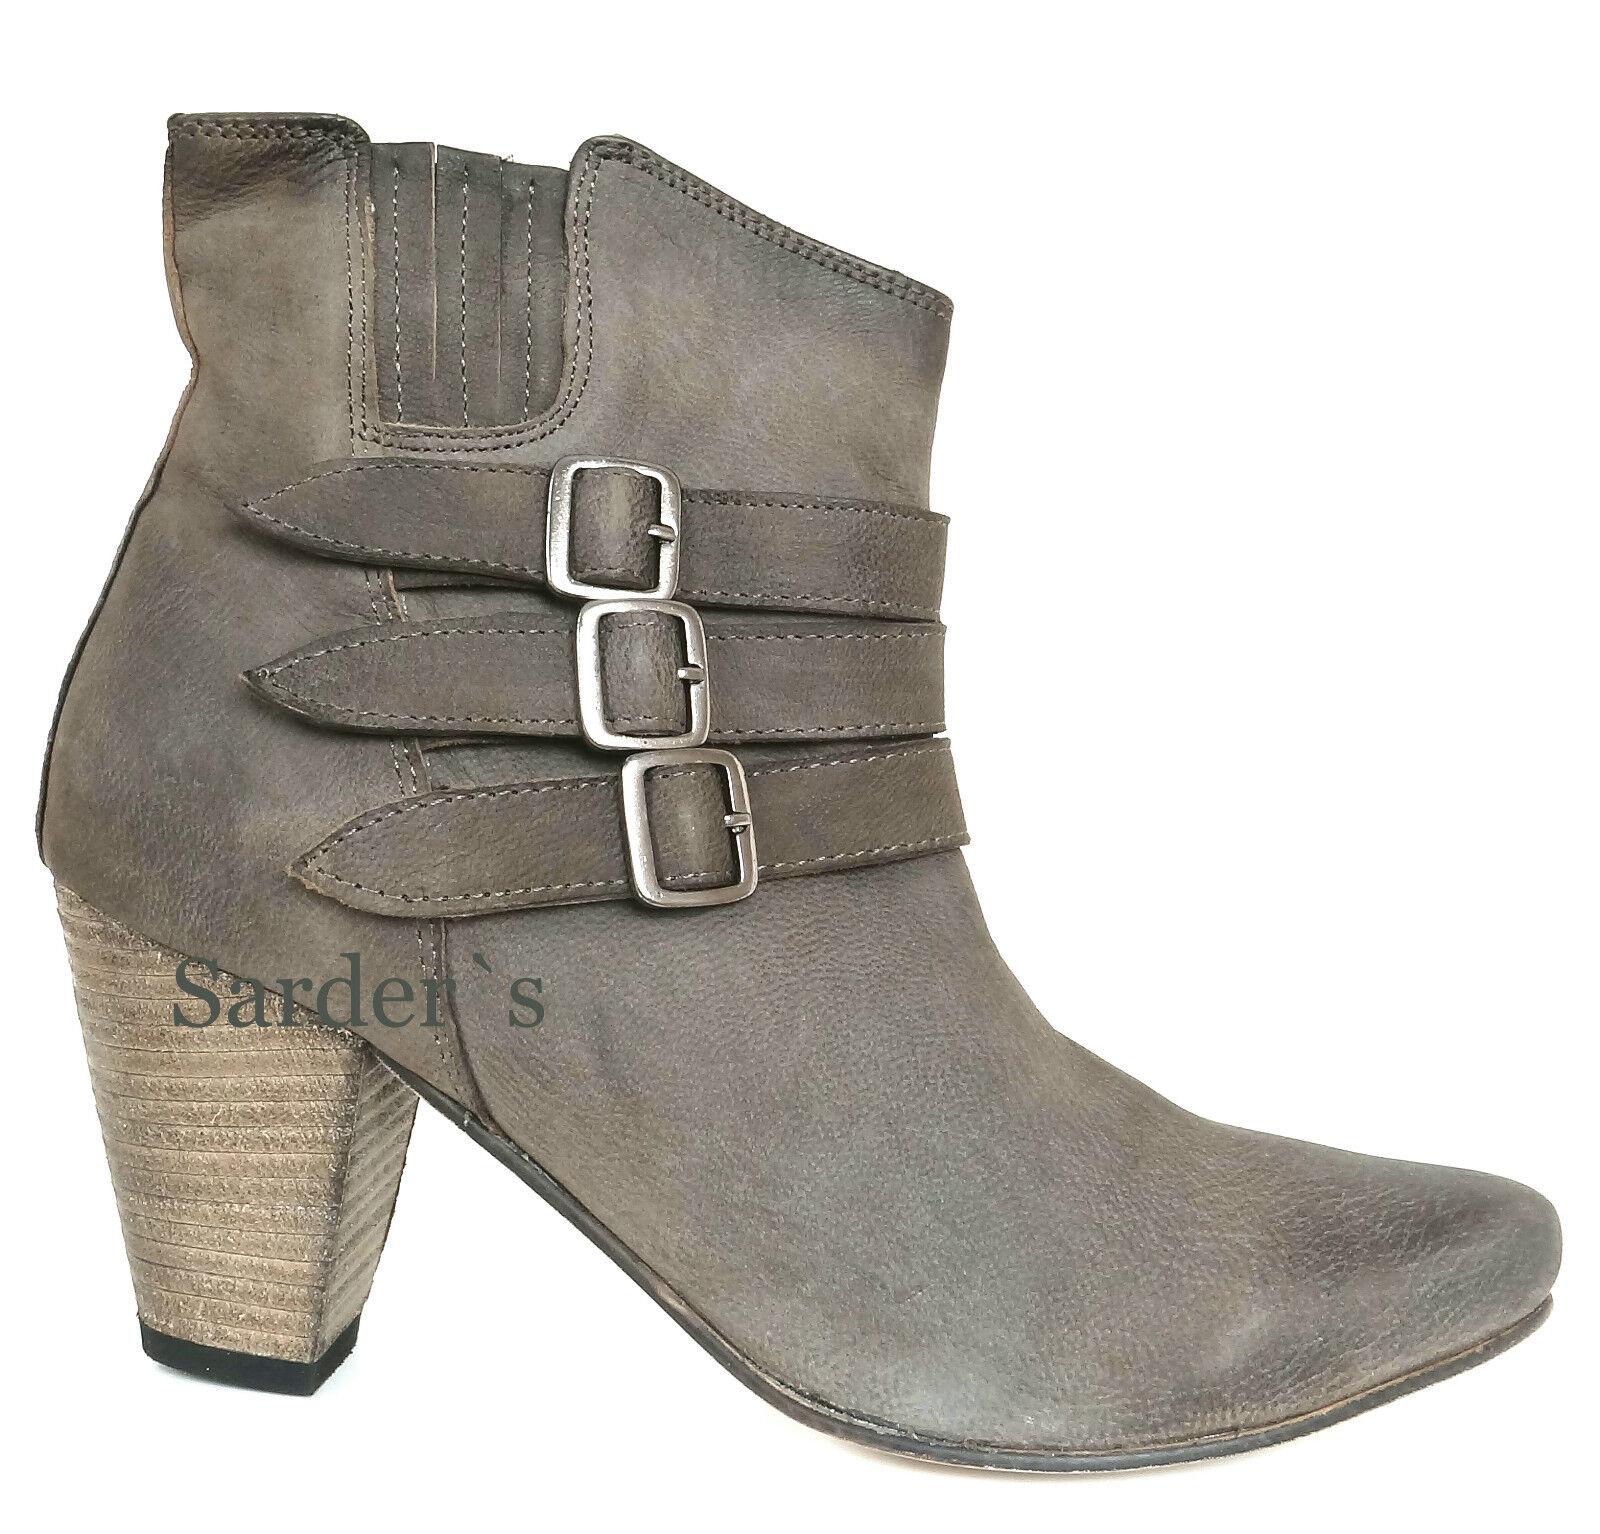 Xyxyx 39 Stiefelette 37 38 39 Xyxyx 40 41 42 Nappa Leder Edel Stiefel Grau Khaki Antik NEU 6671eb